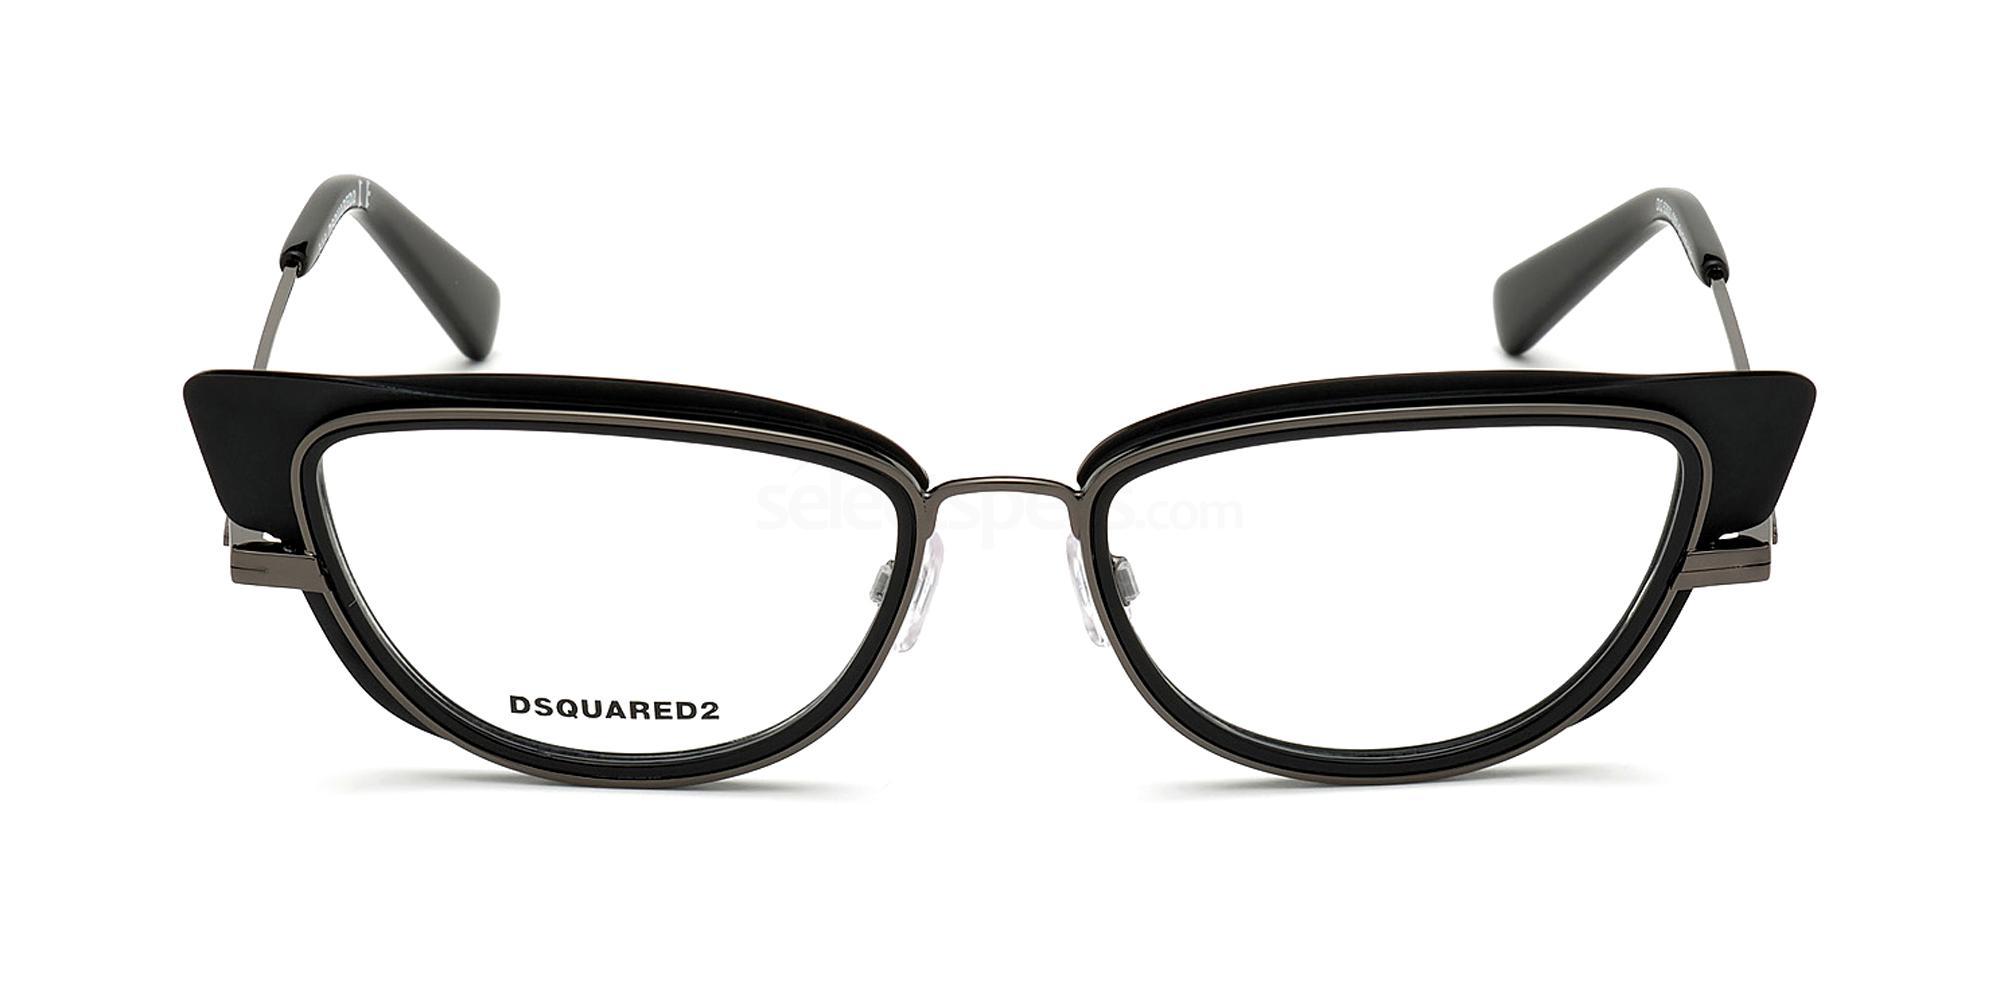 002 DQ5303 Glasses, DSQUARED2